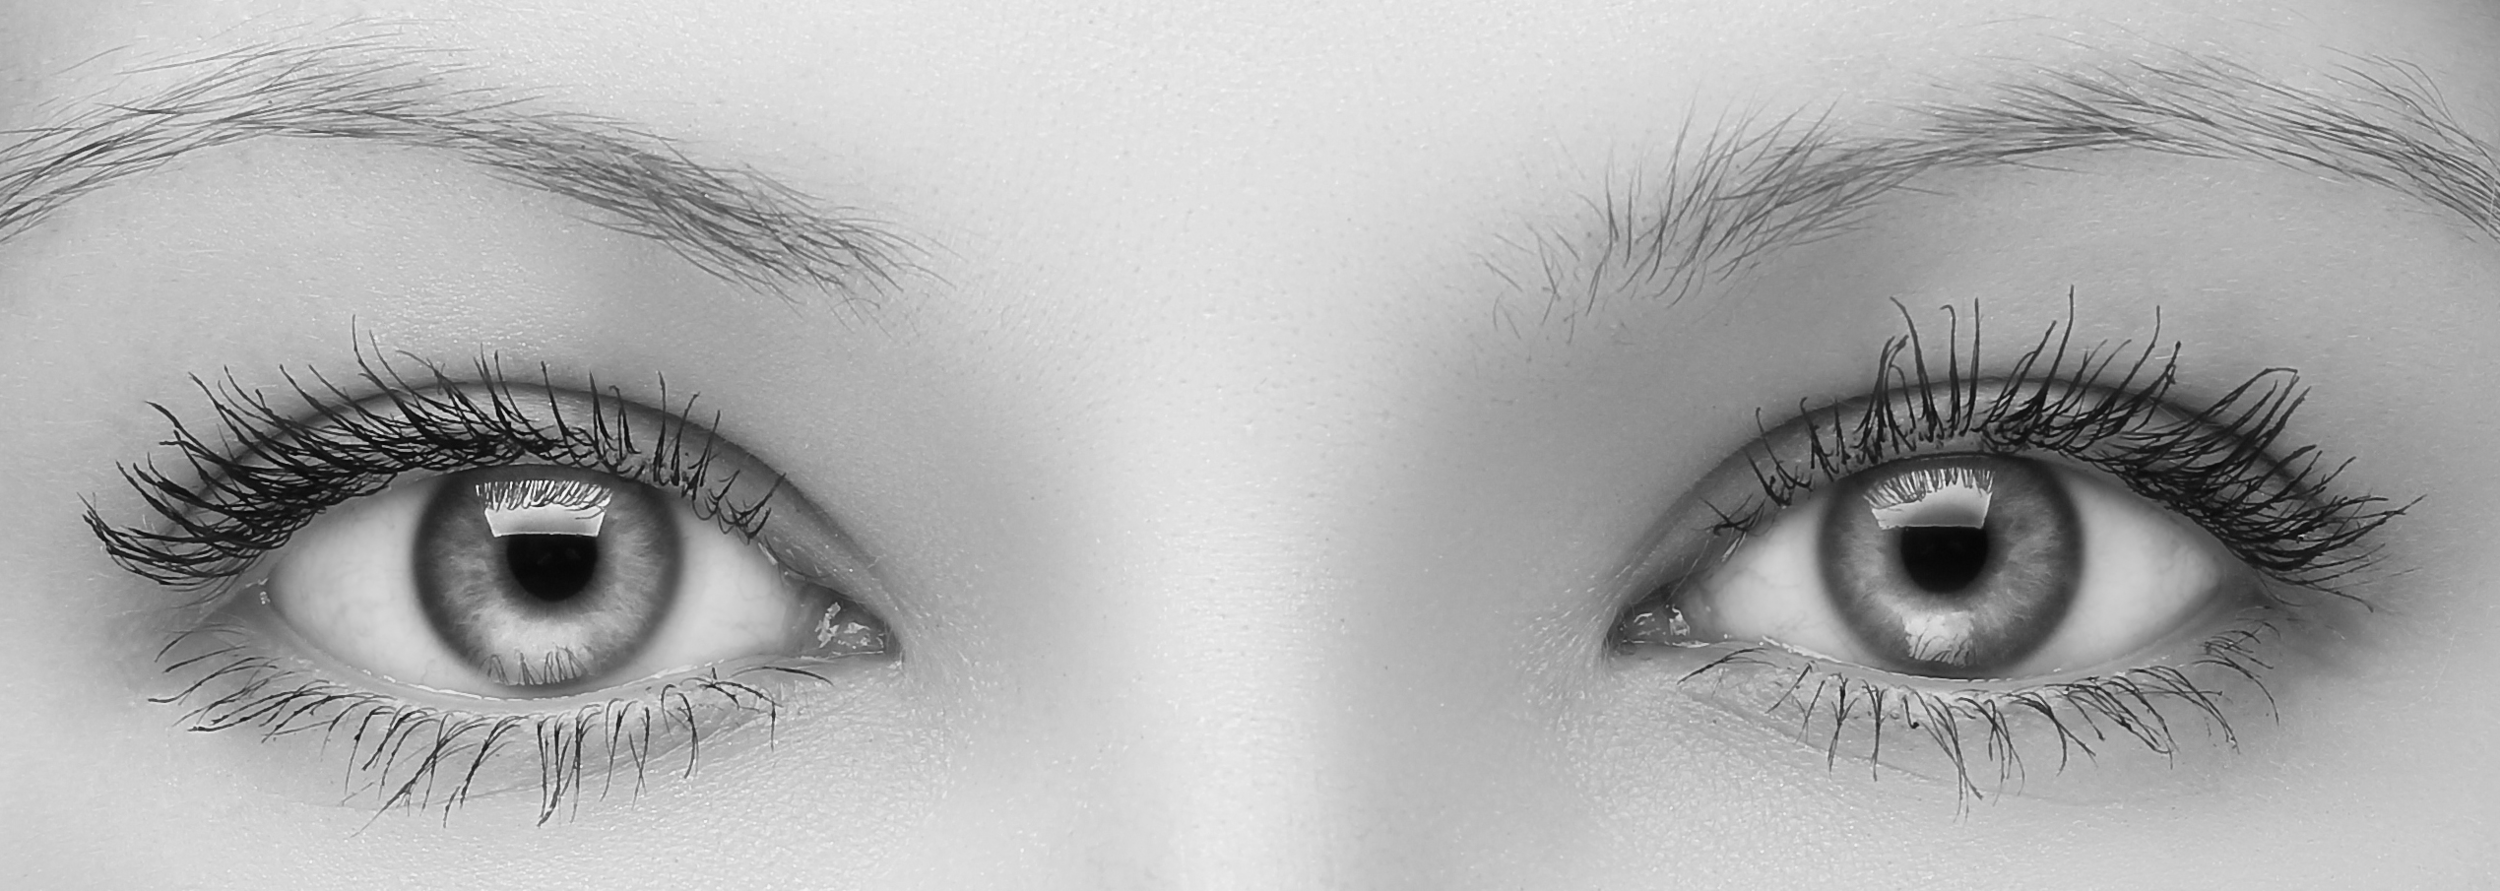 eye health at brad abrahams.jpg